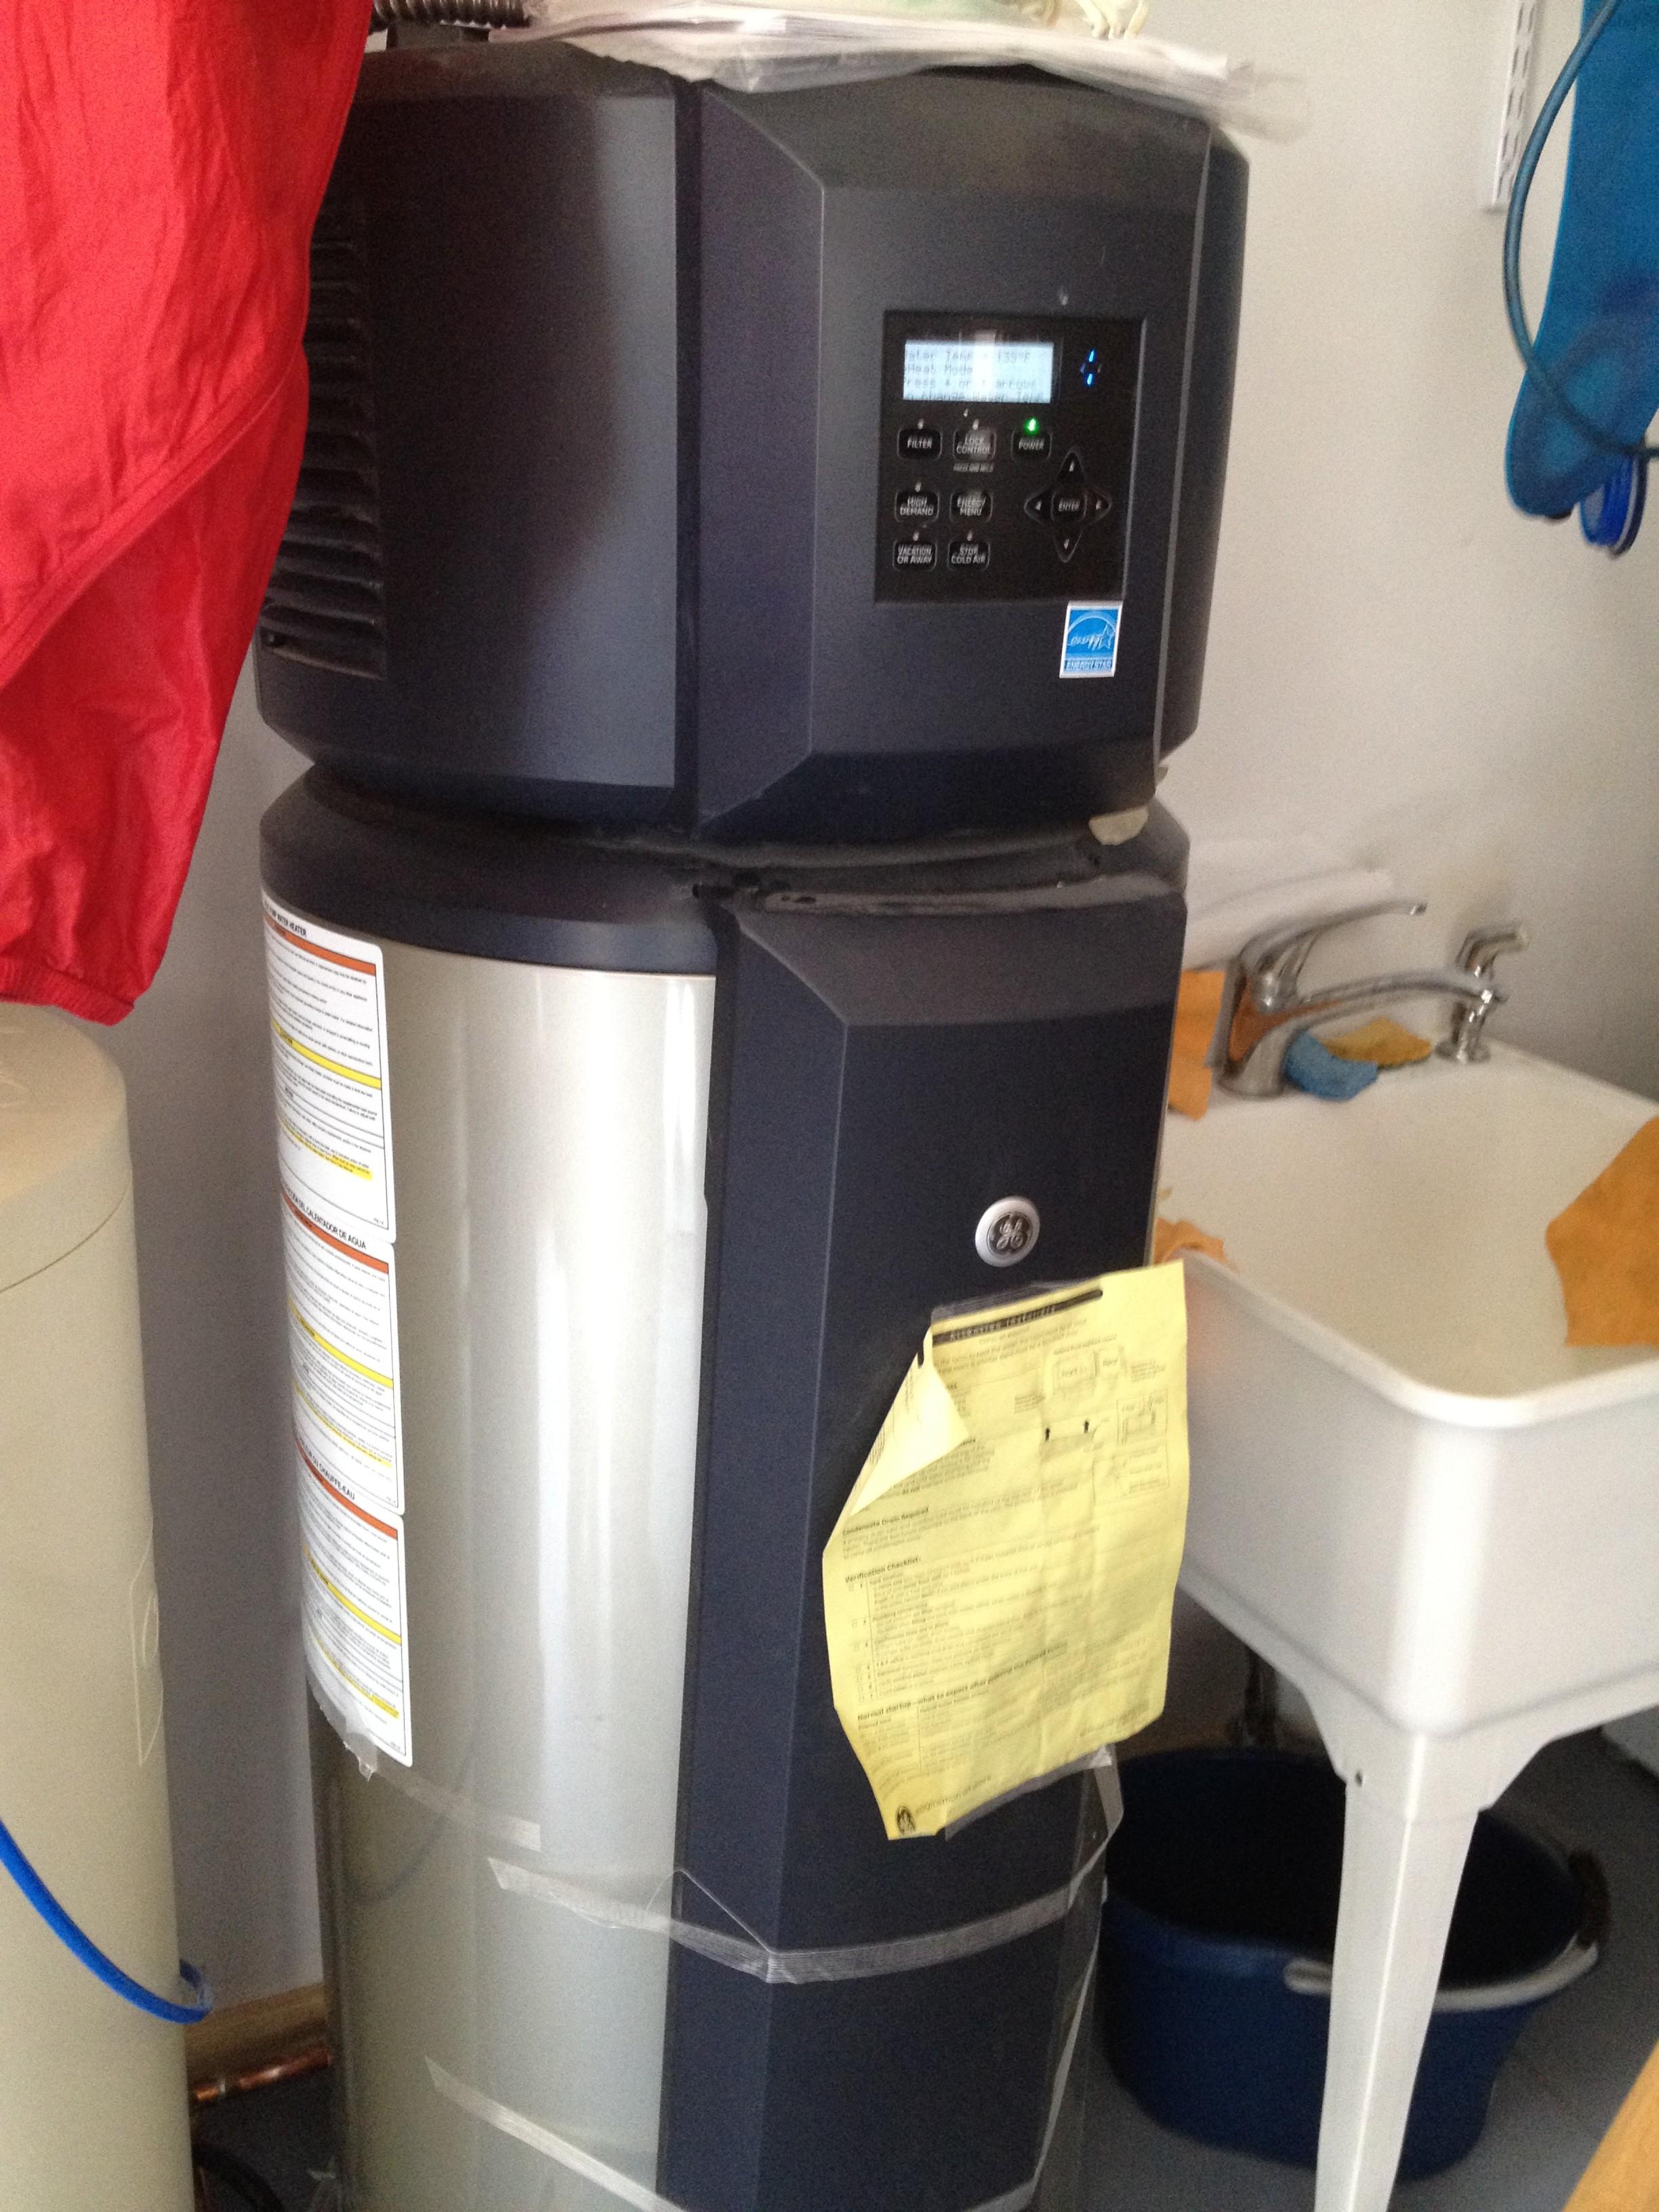 GE heat pump hot water heater in a Boulder Passive House.